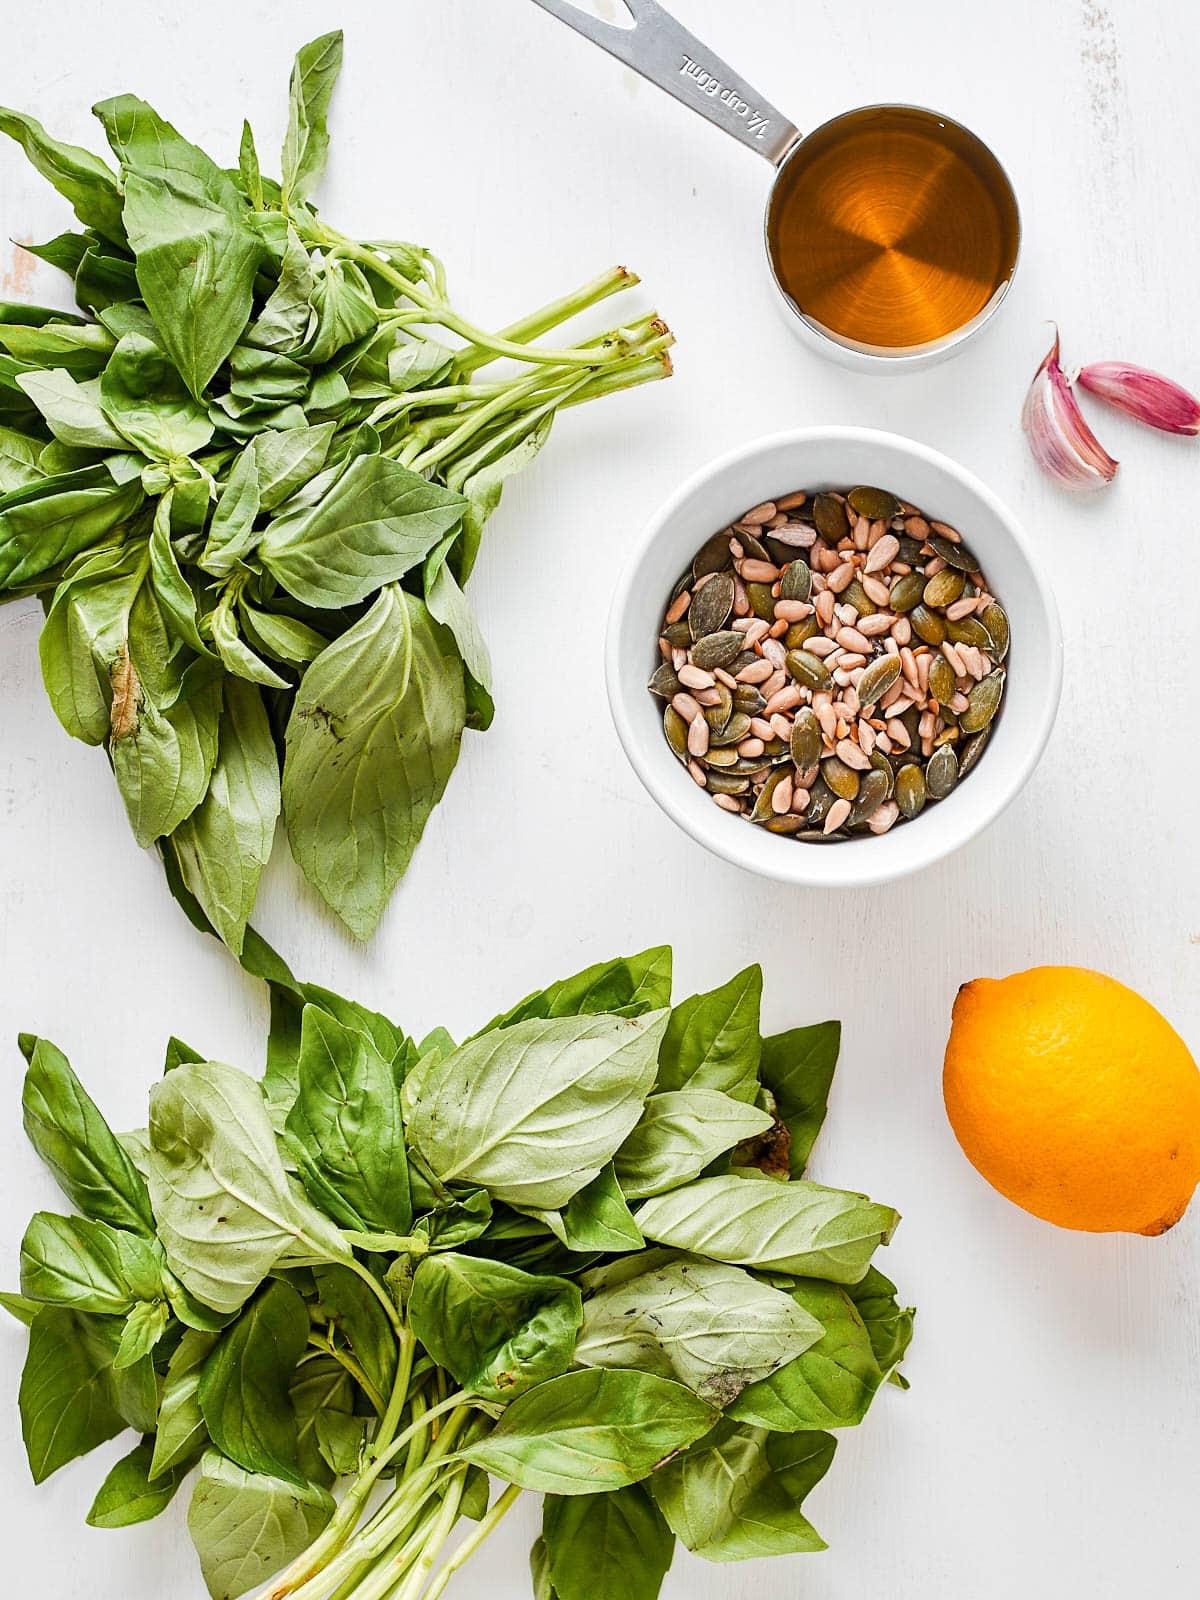 Ingredients for homemade pesto- basil, olive oil, garlic, seeds, lemon